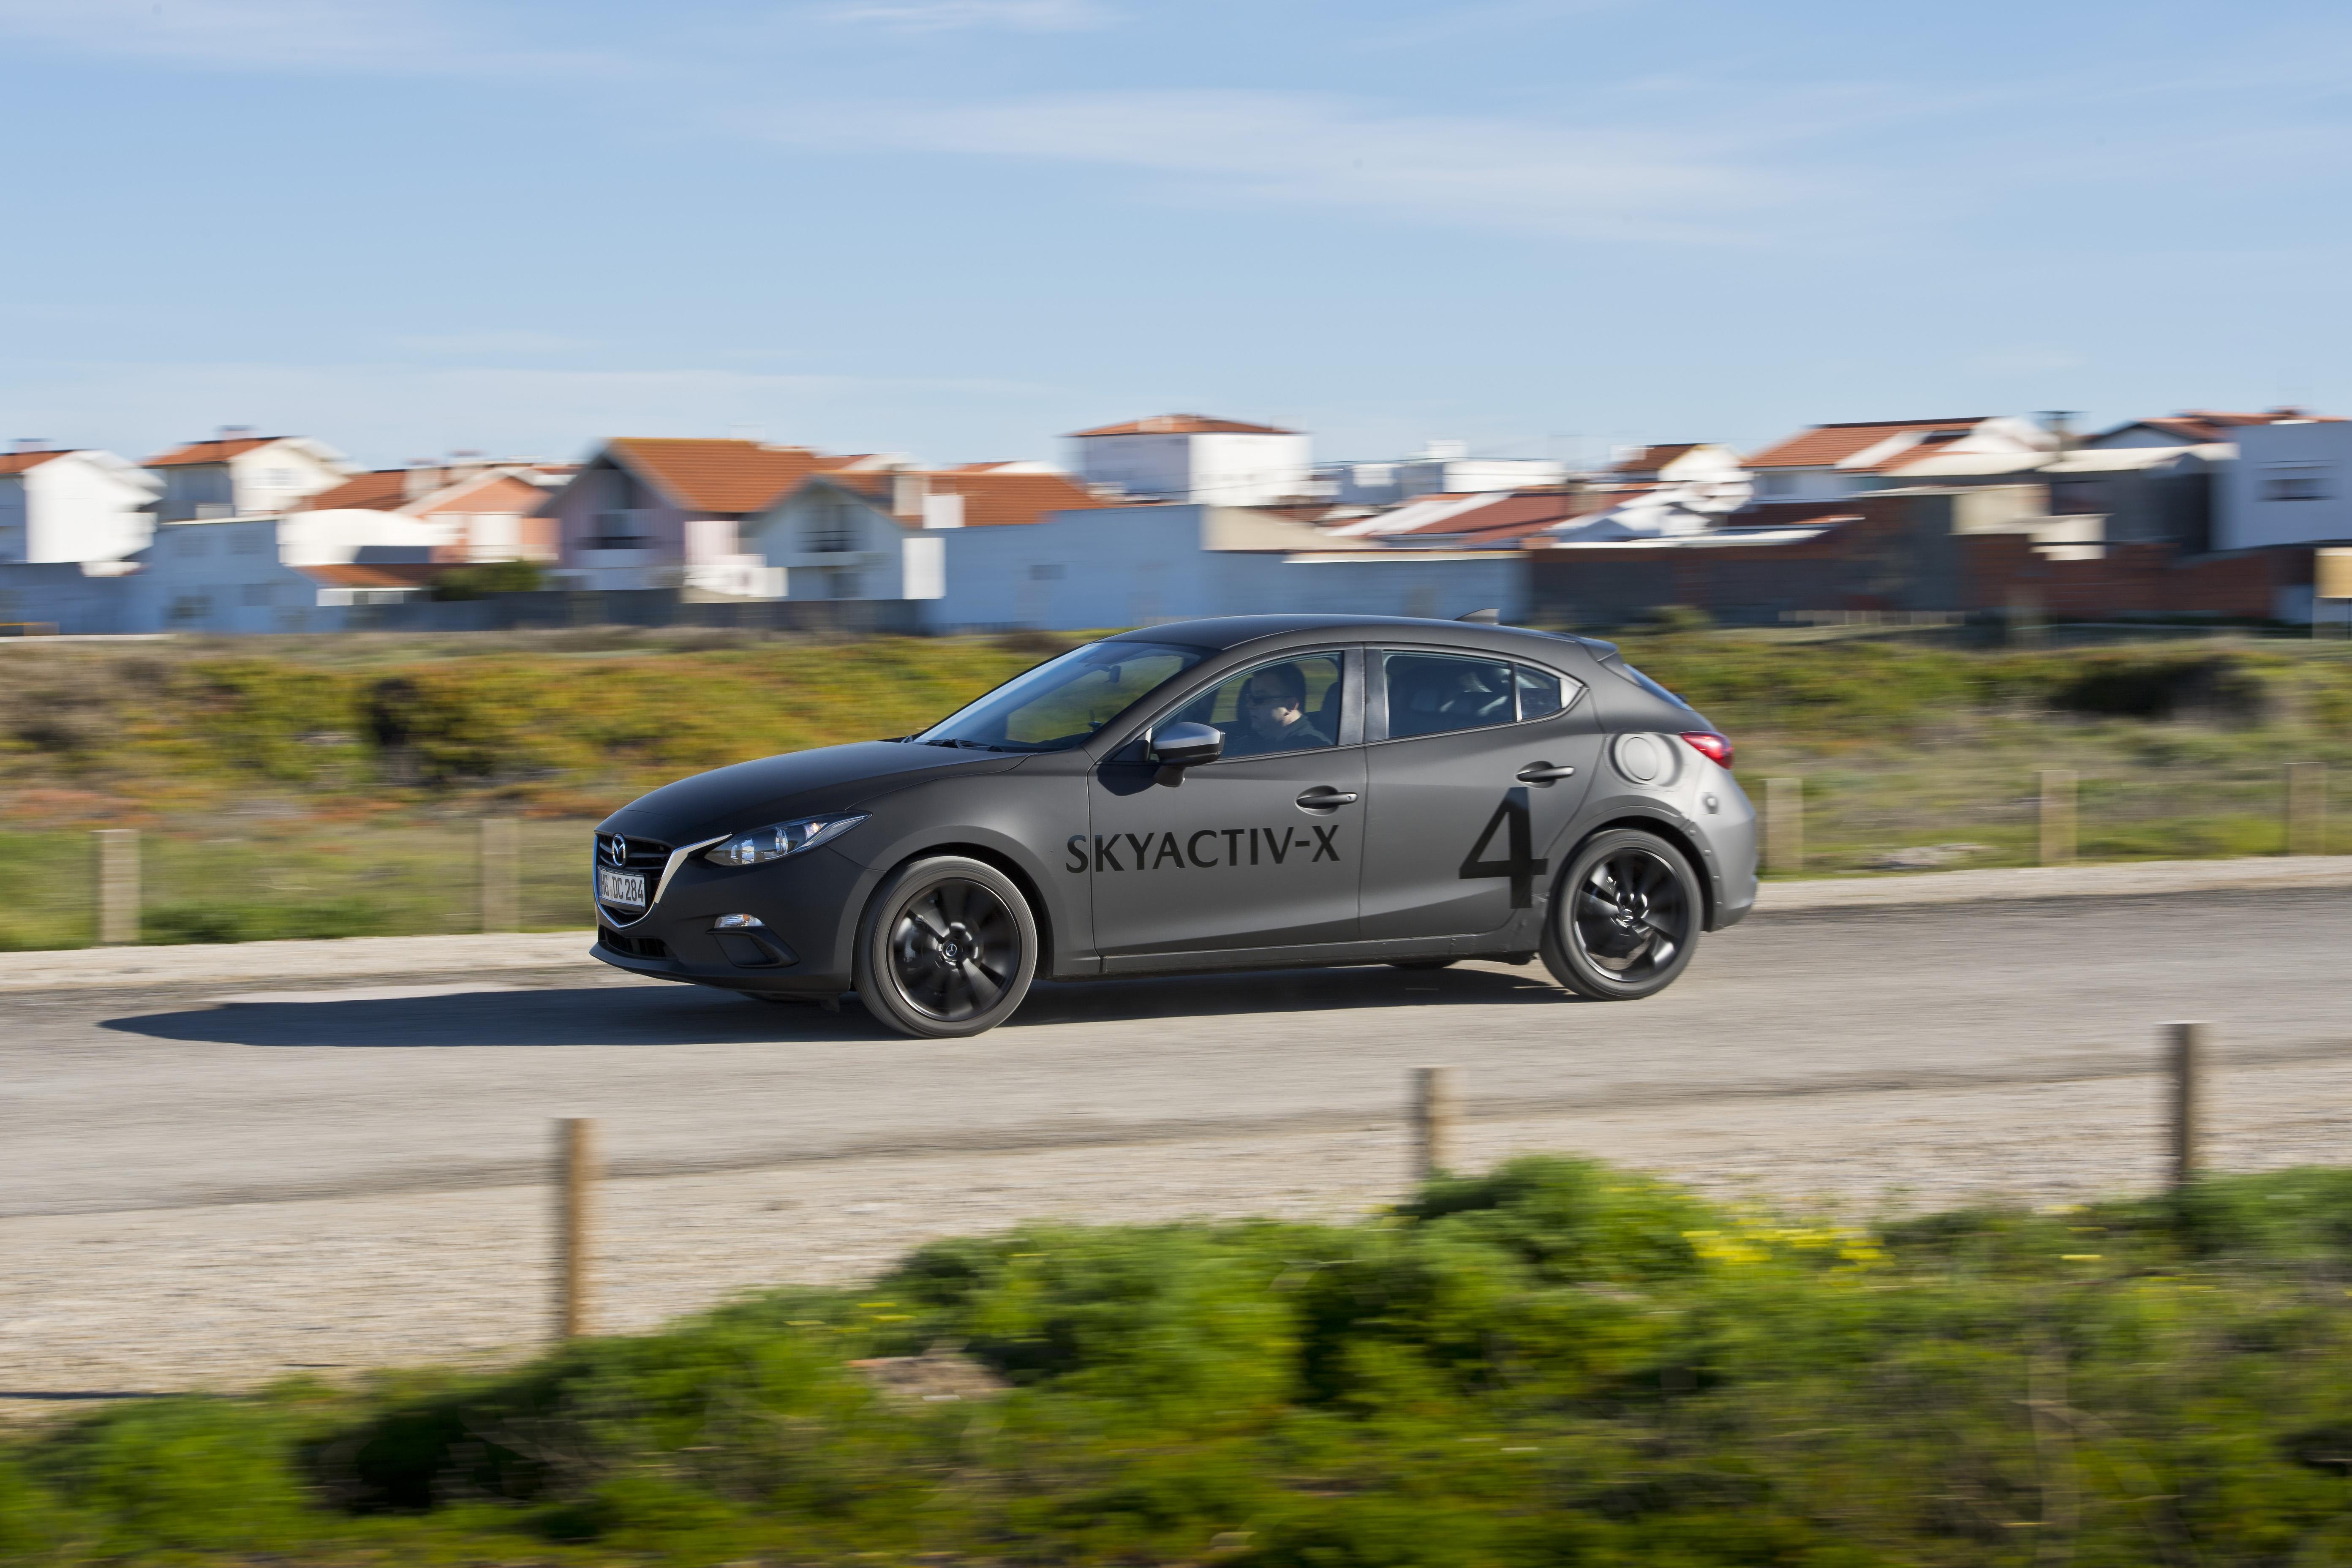 SKYACTIV-X_Porto_Driving_25_hires